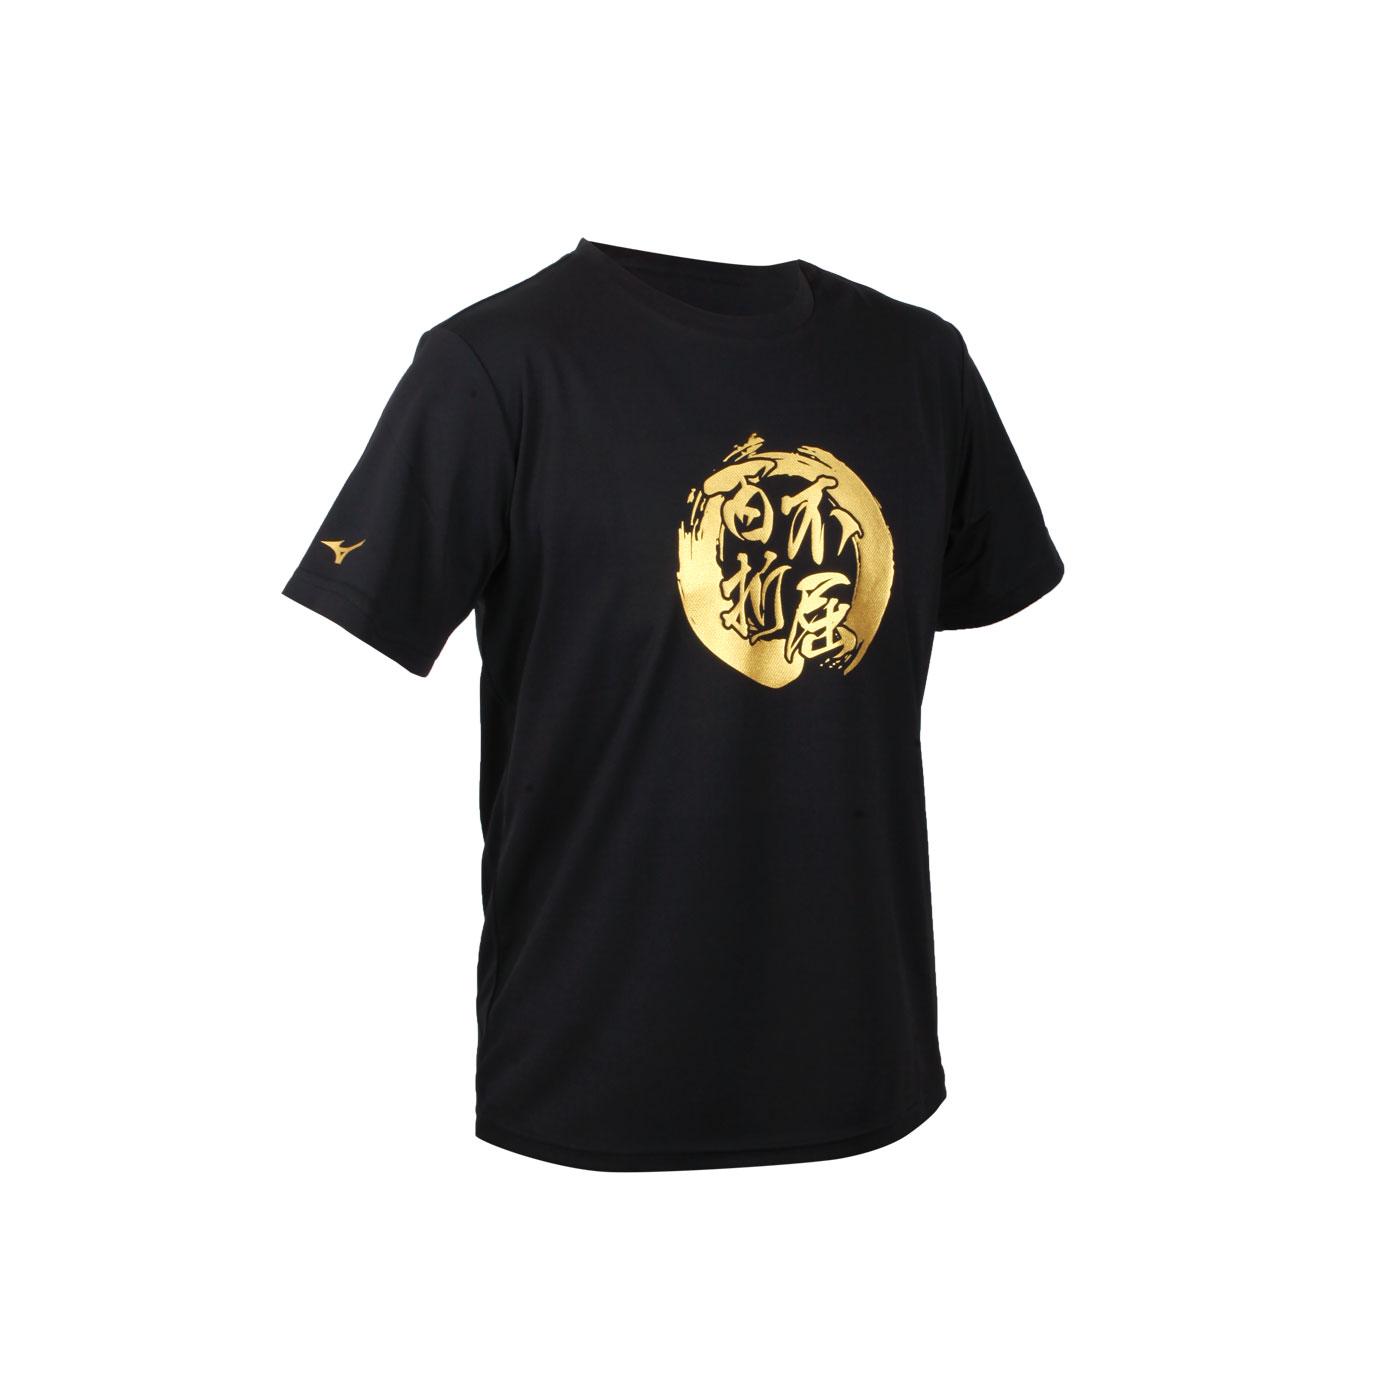 MIZUNO 男款短袖T恤 32TA101109 - 黑金